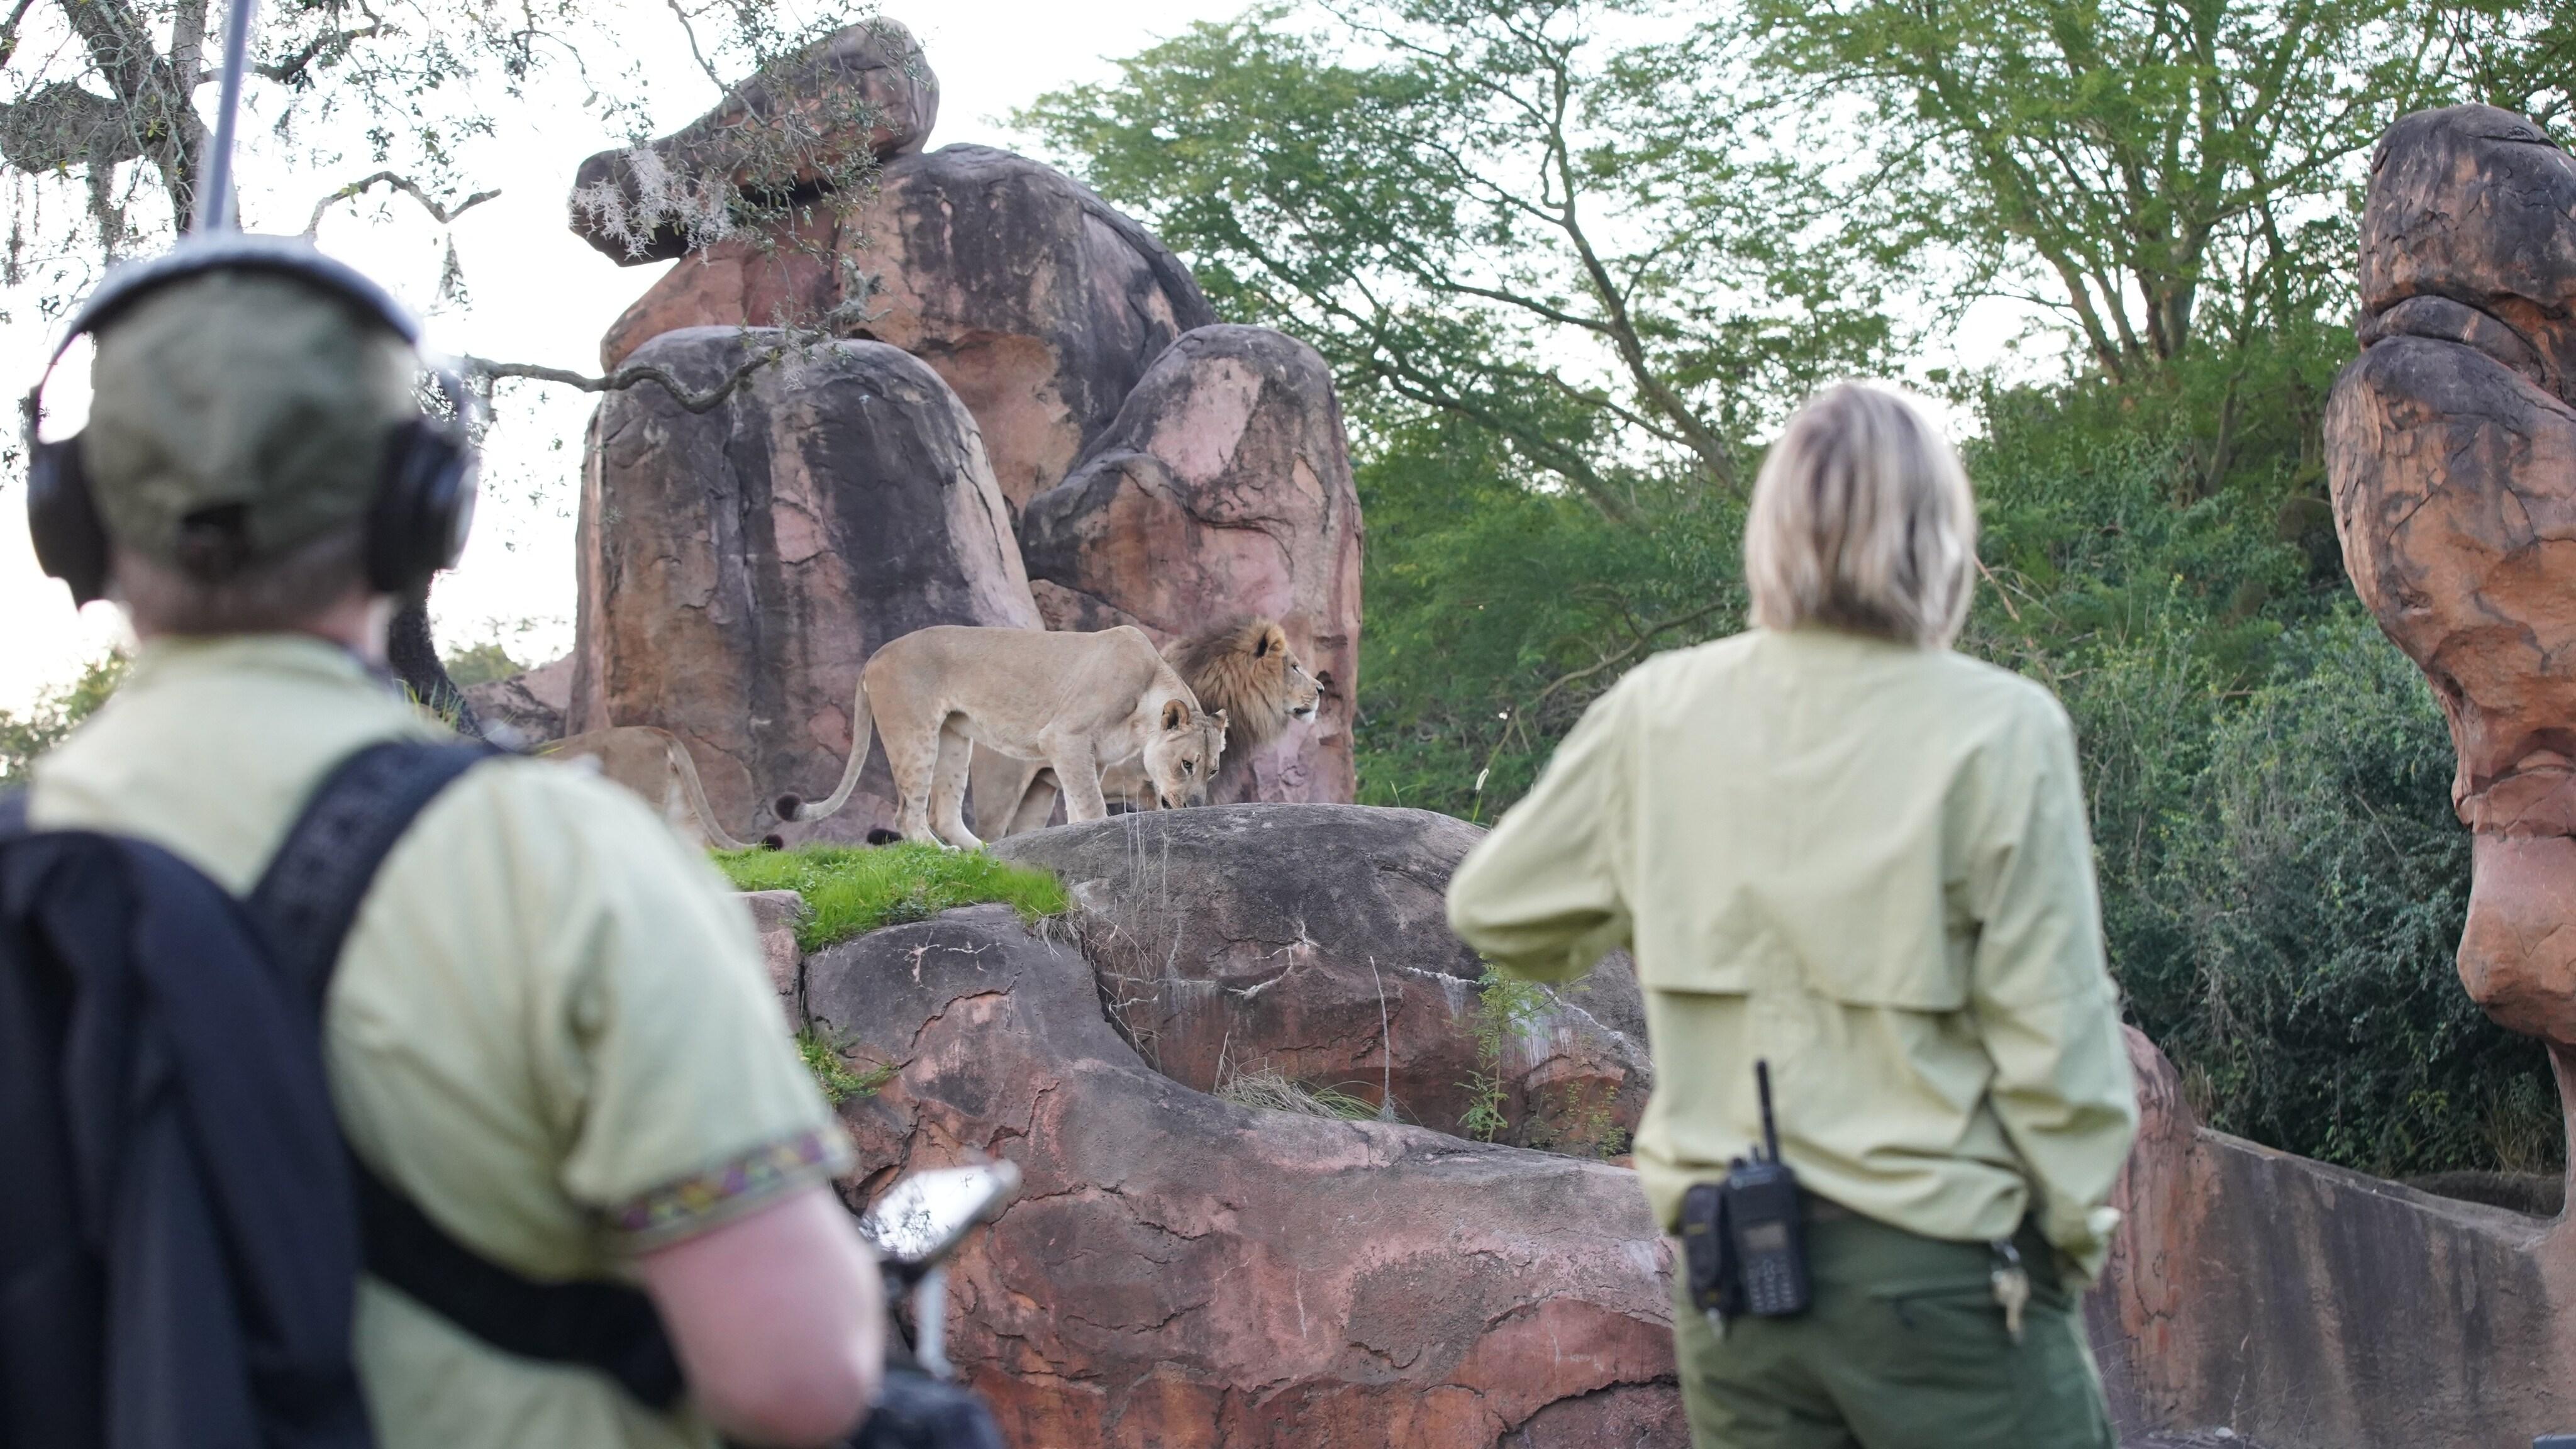 Production team and keeper Lori Kurdziel observing lions Kinsey and Dakari. (Disney)